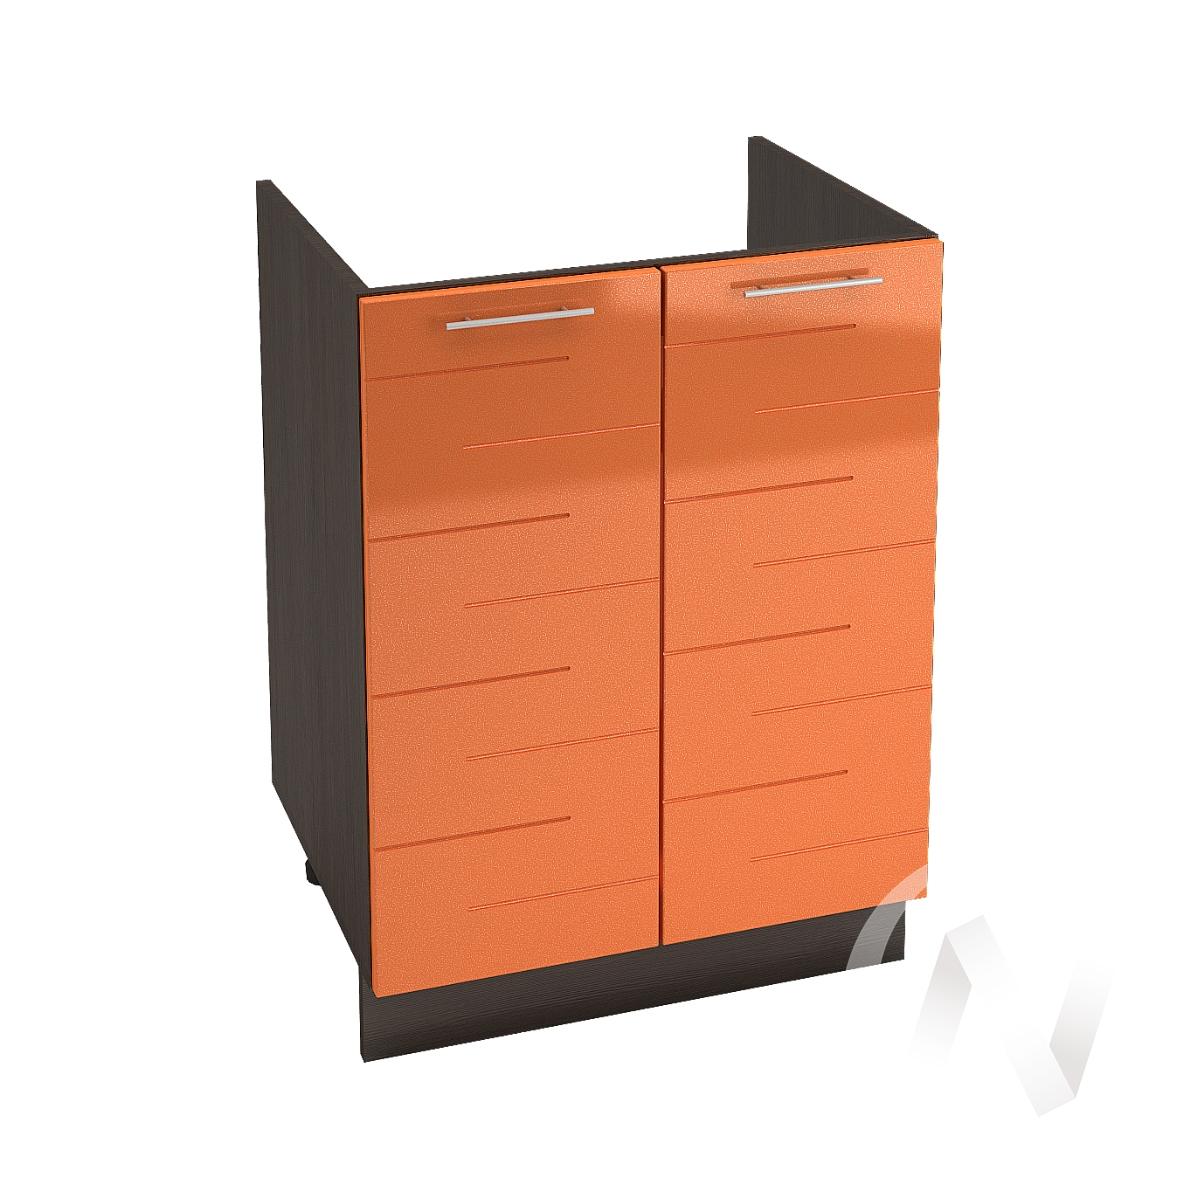 "Кухня ""Техно"": Шкаф нижний под мойку 600, ШНМ 600 новый (корпус венге)"